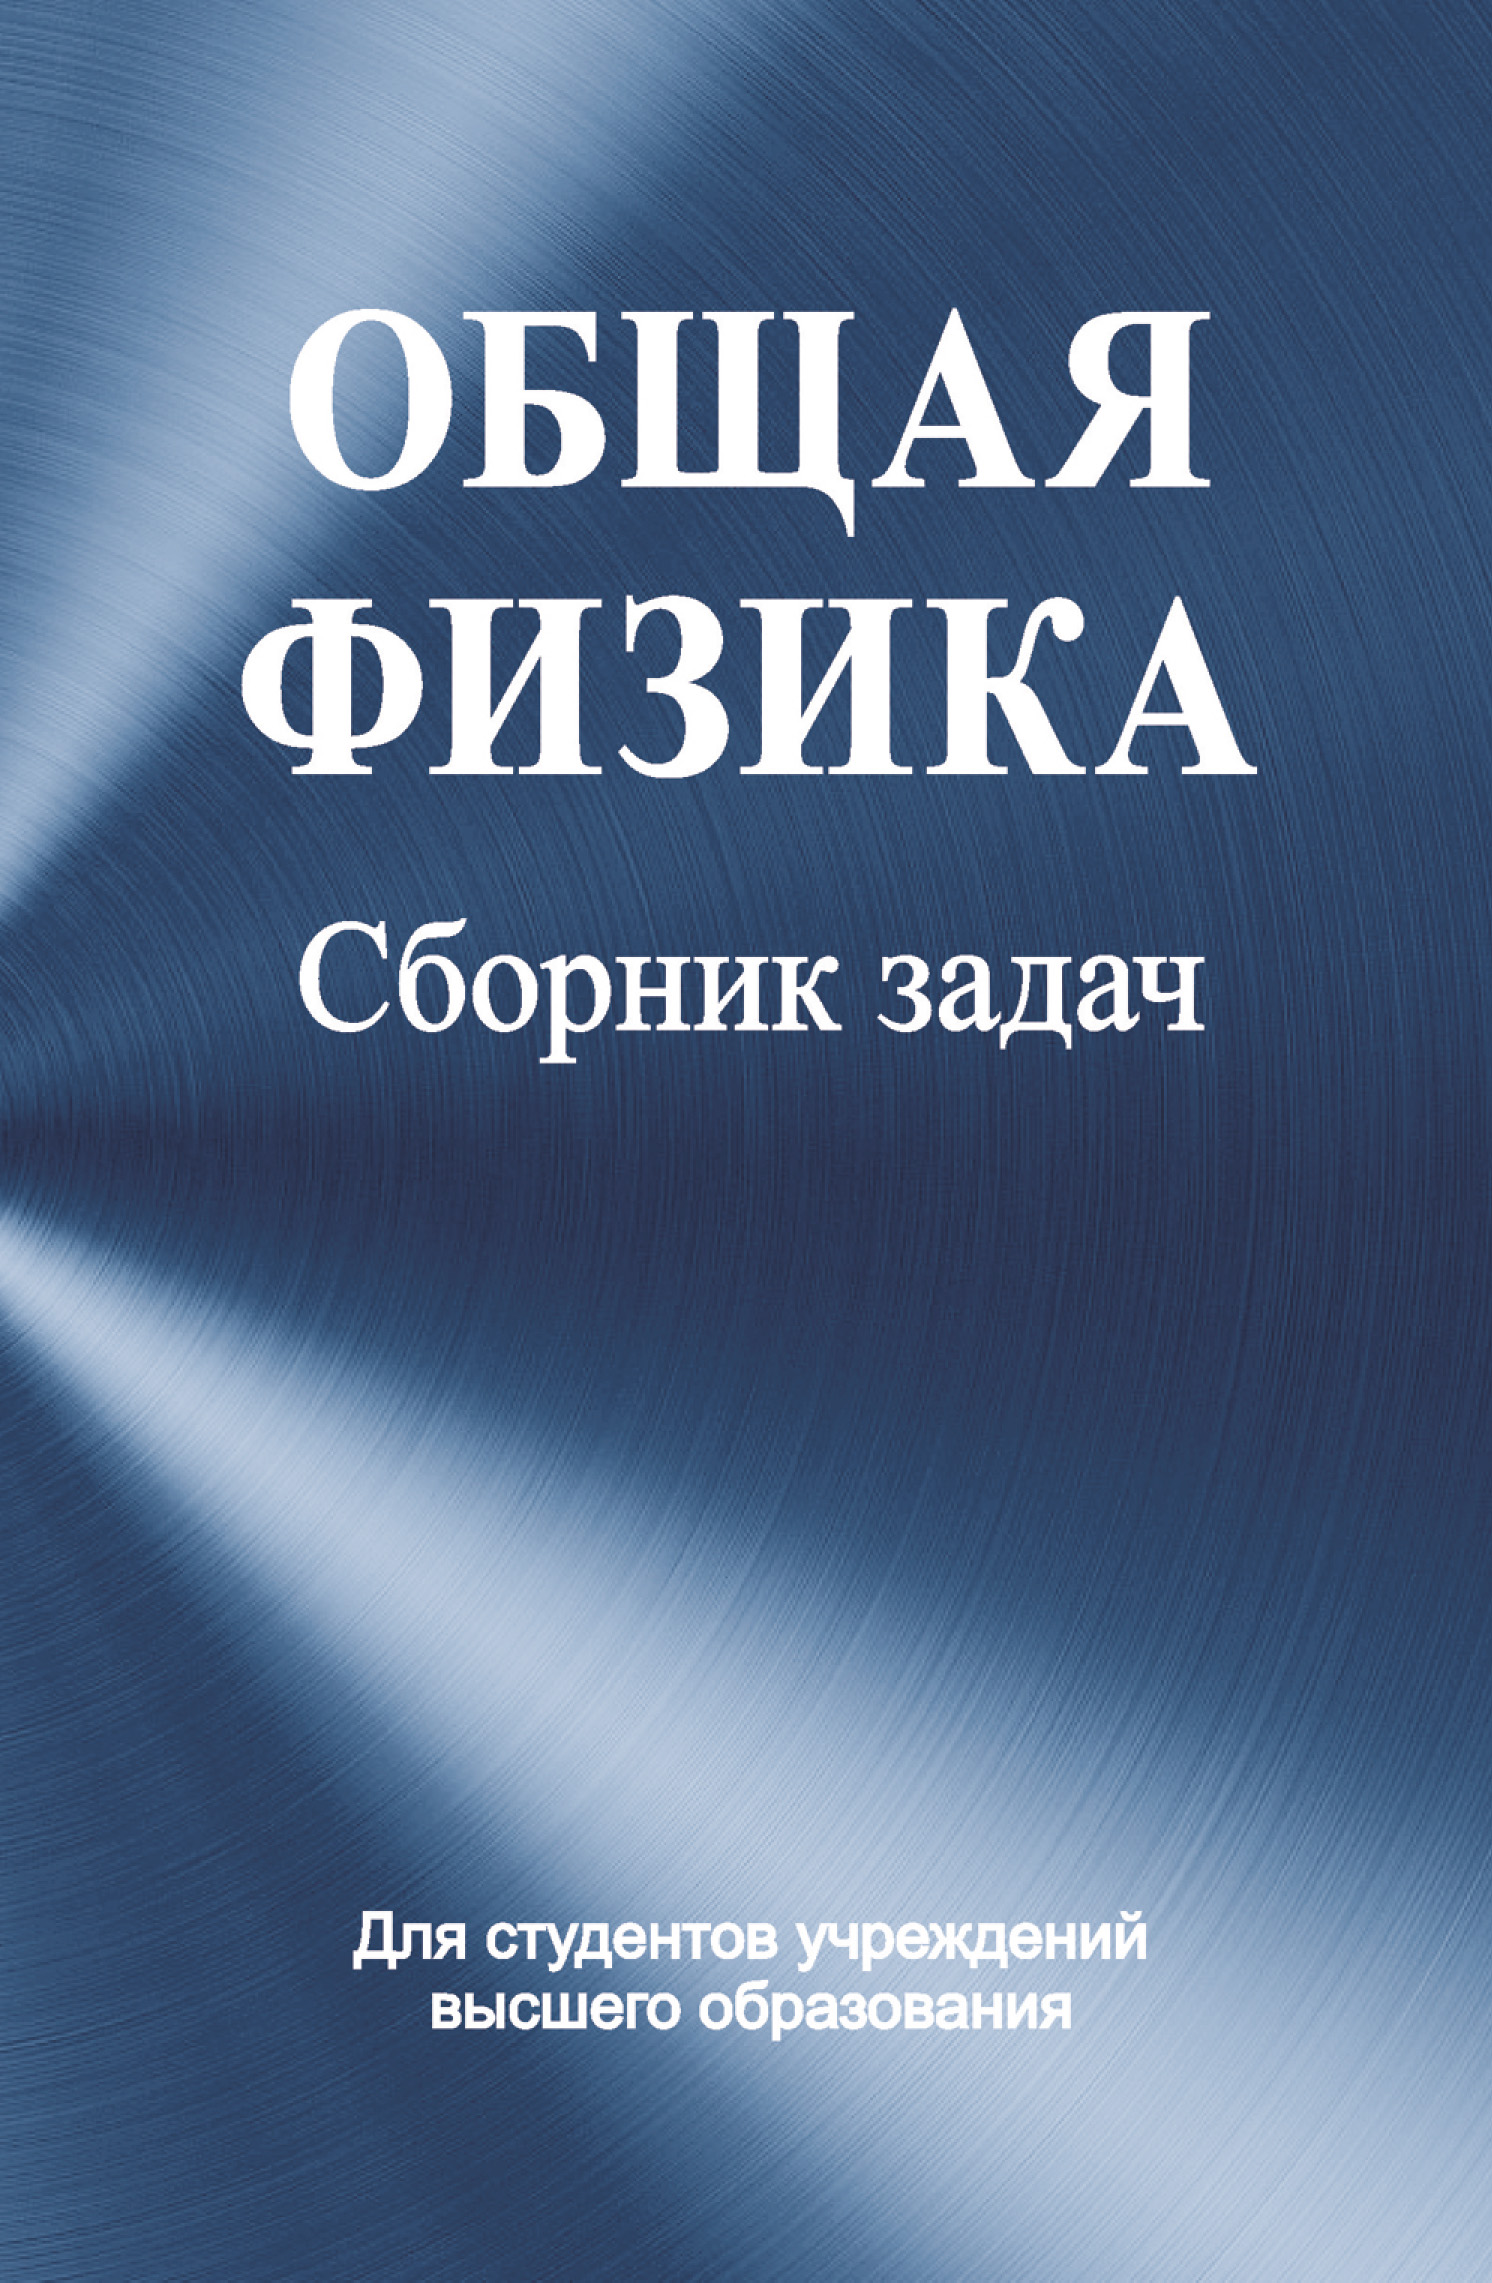 Коллектив авторов Общая физика. Сборник задач цена и фото